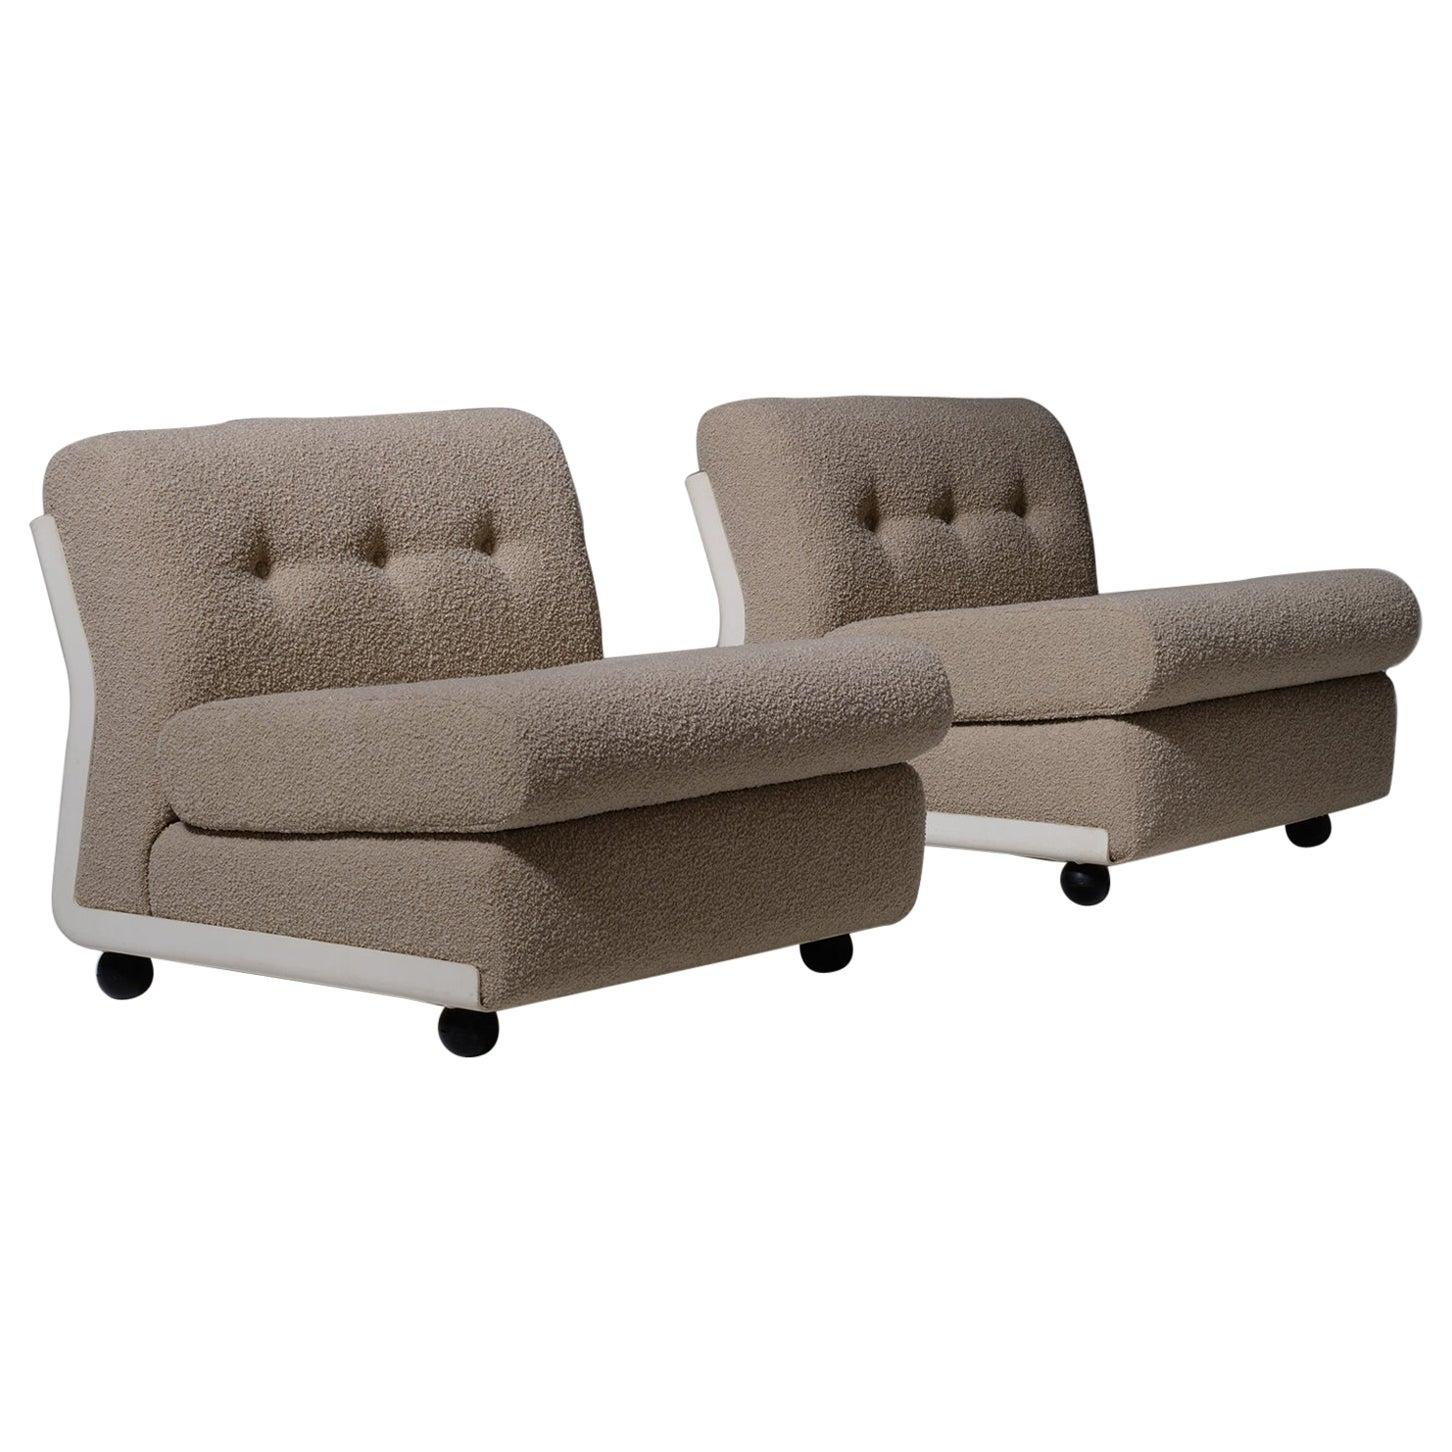 Set of Two Amanta Modular Sofa Elements by Mario Bellini for B&B Italia